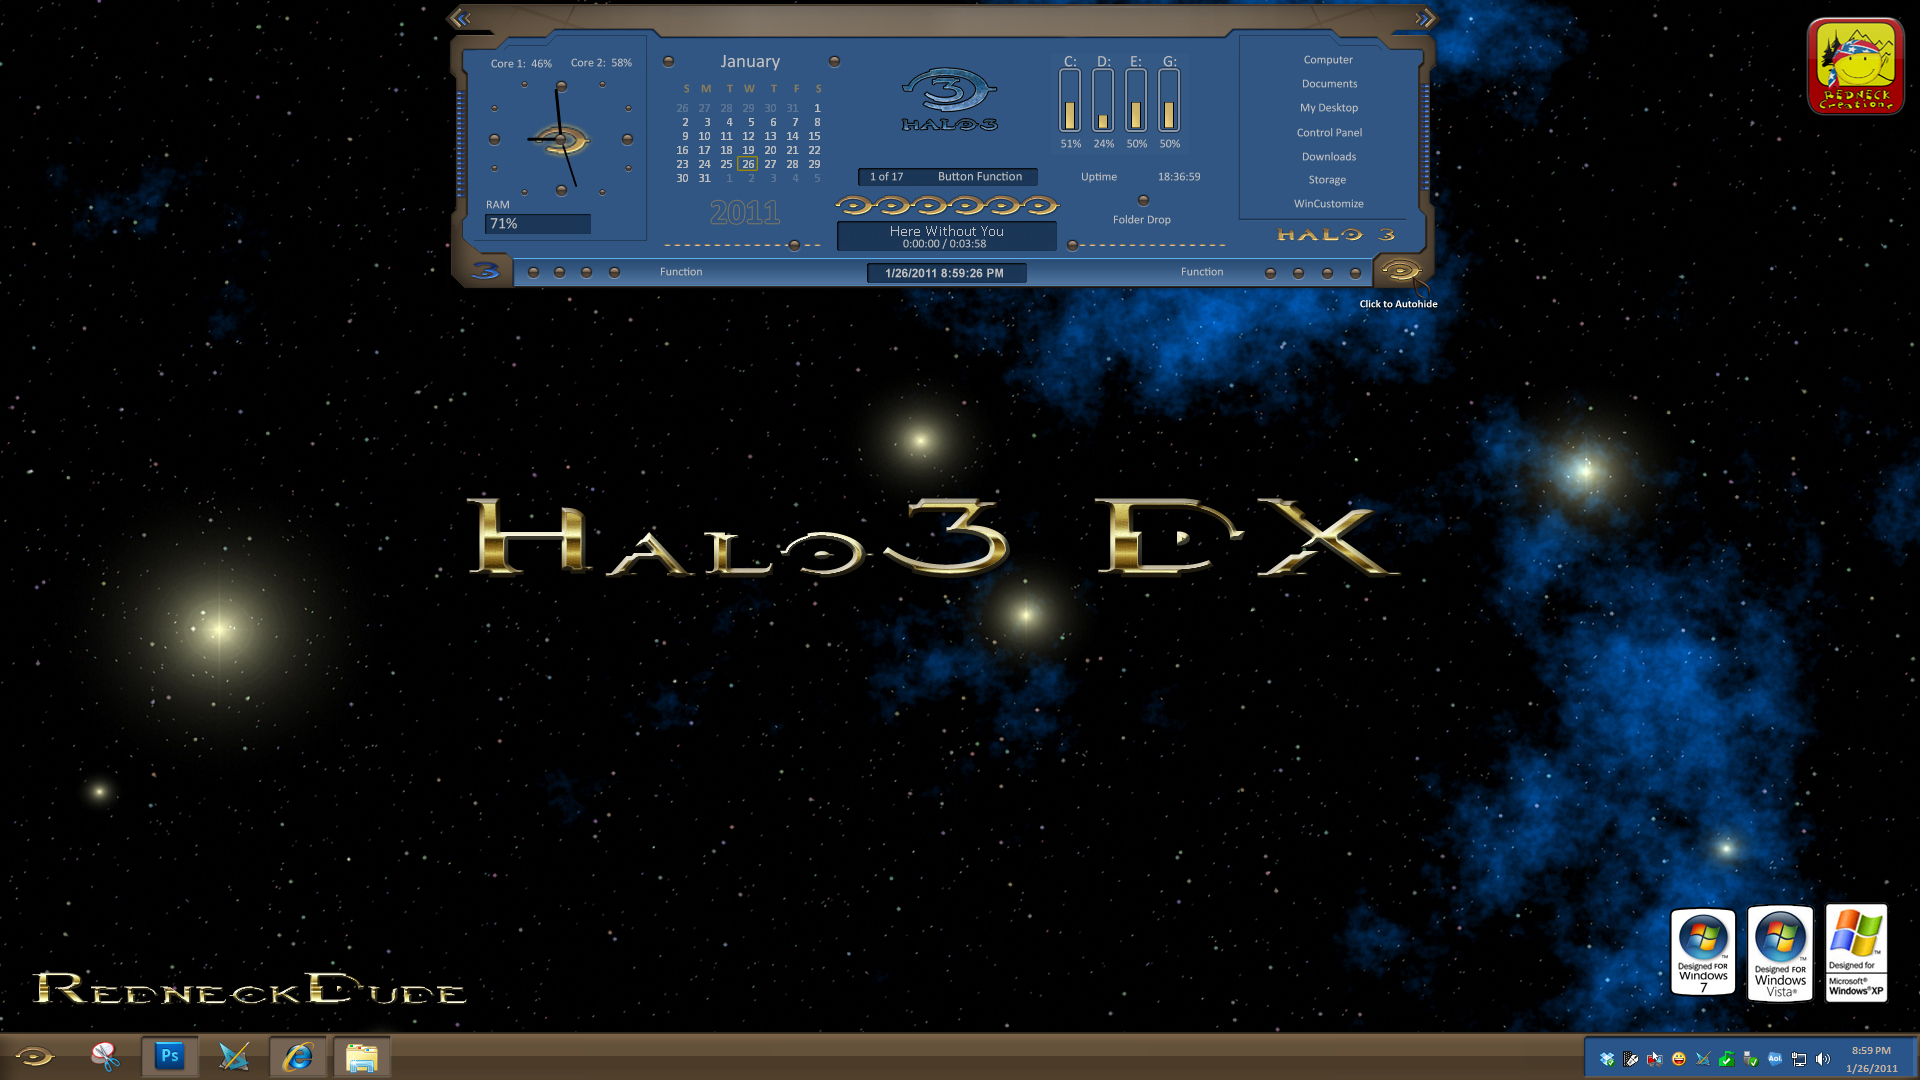 Halo3 DX